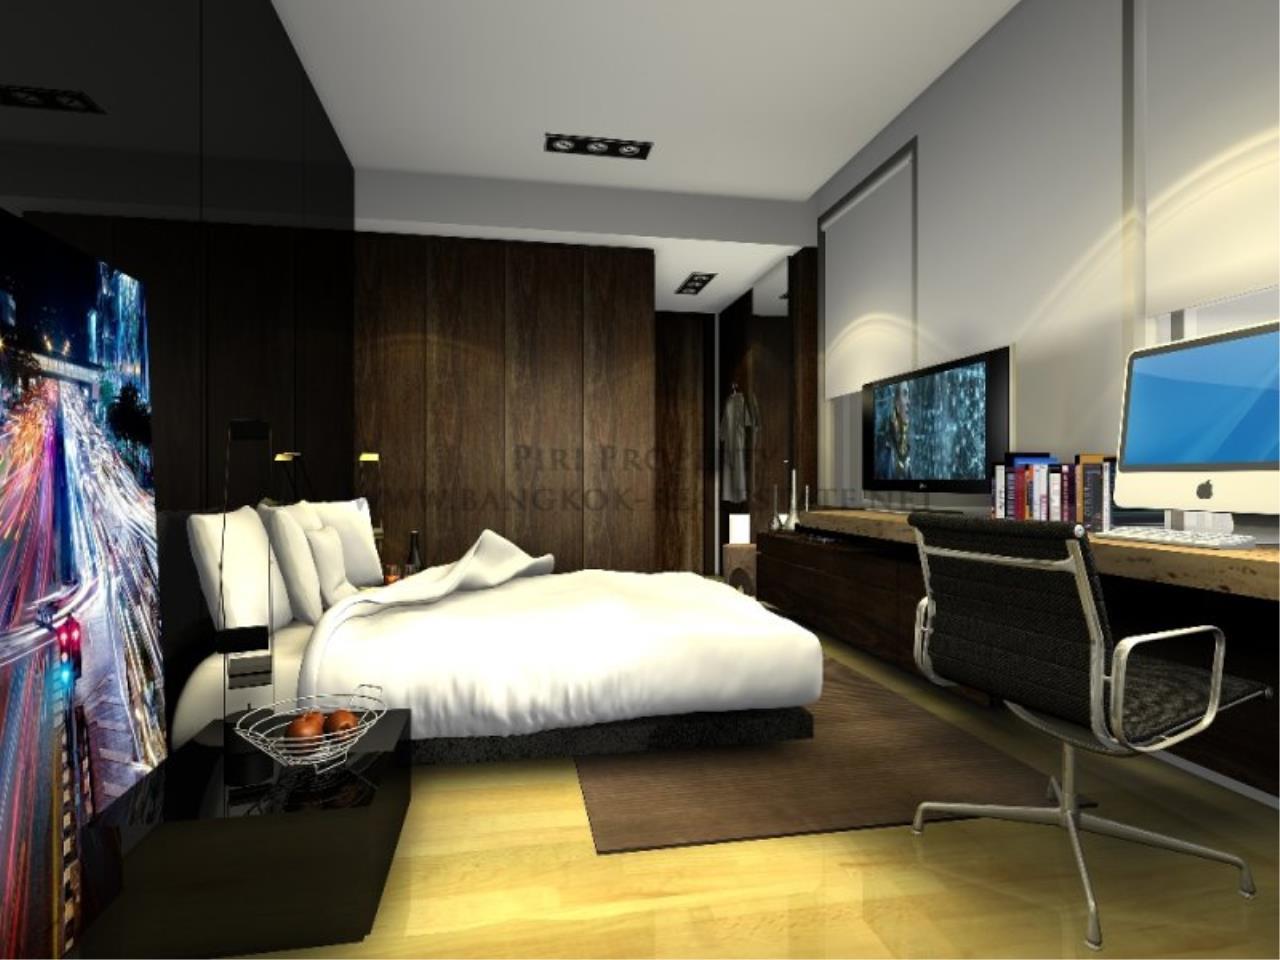 Piri Property Agency's Amazing Bachelor Duplex Condo near Siam - Villa Ratchatewi 2